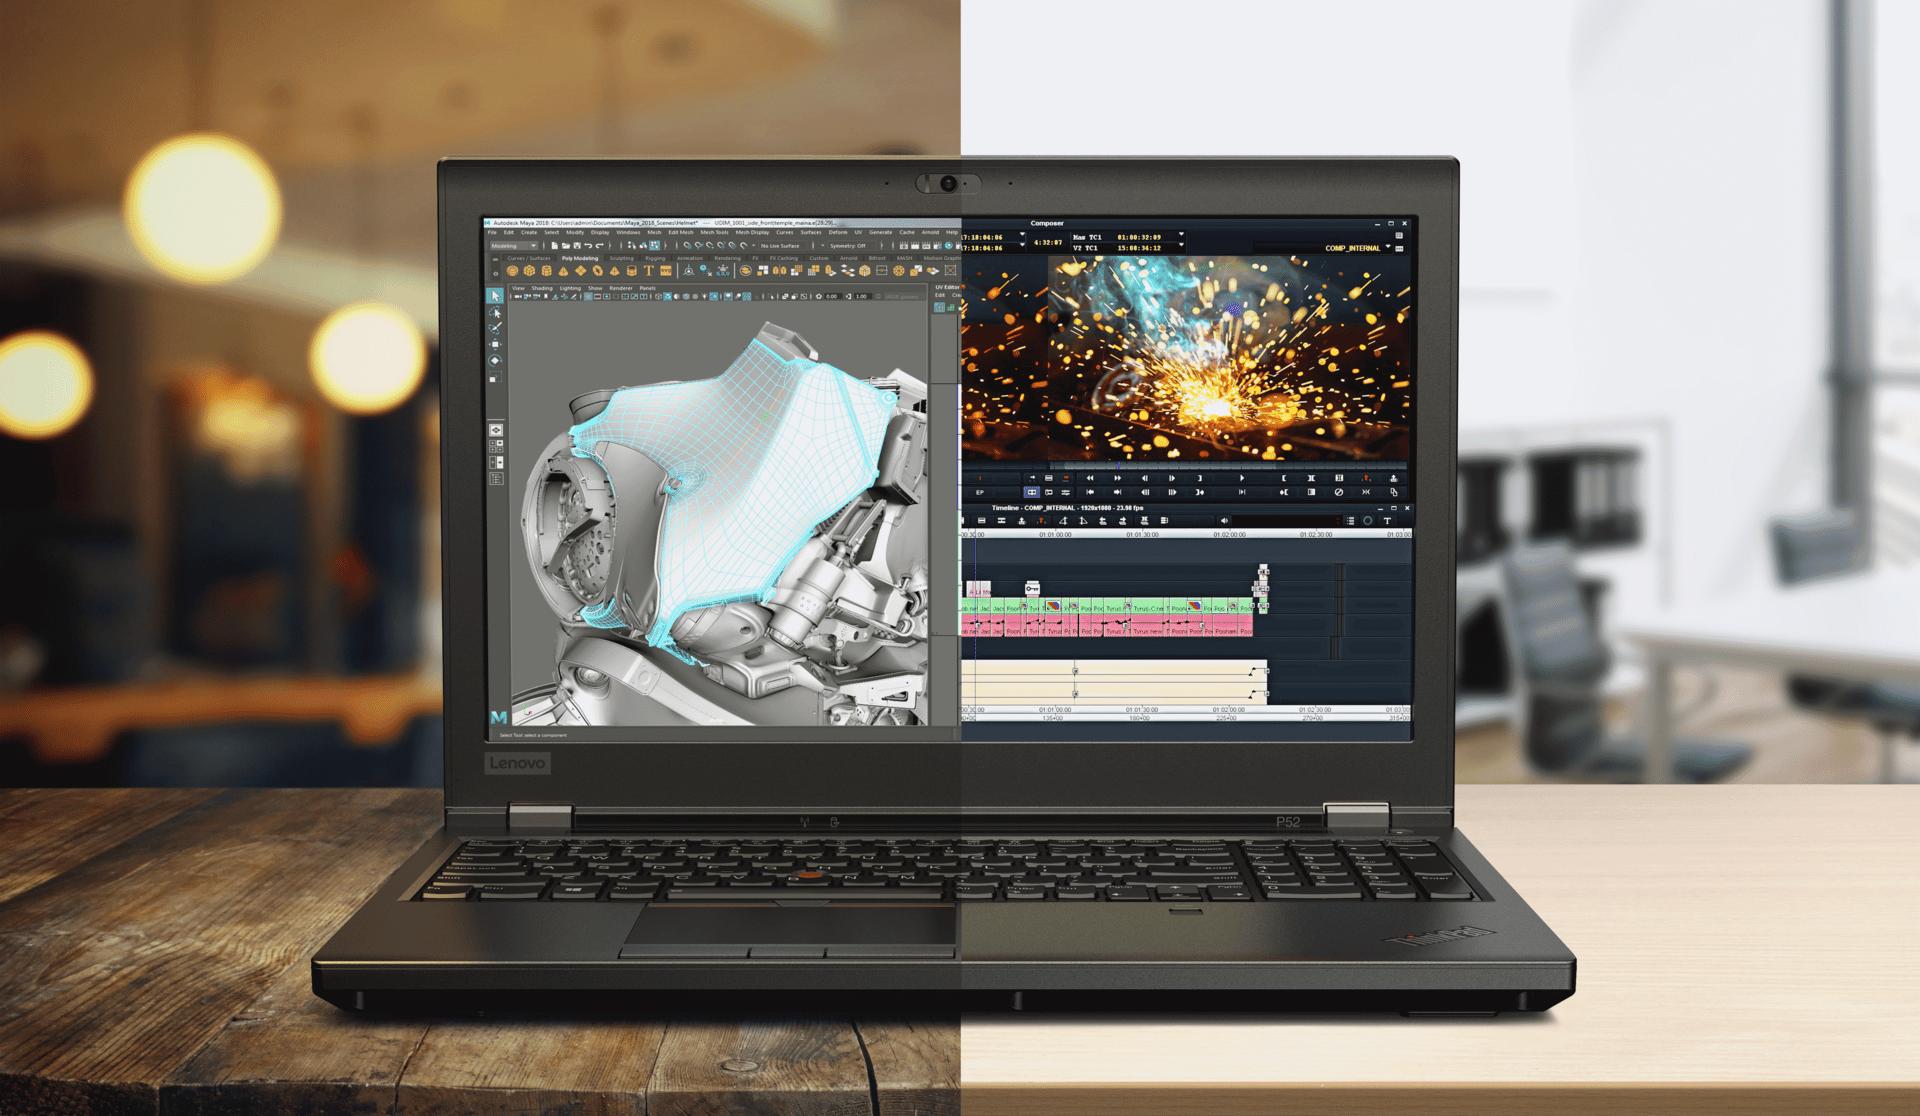 "Lenovo ThinkPad P52, PC portable 15"" Pro avec Quadro P3200 et Coffee Lake"